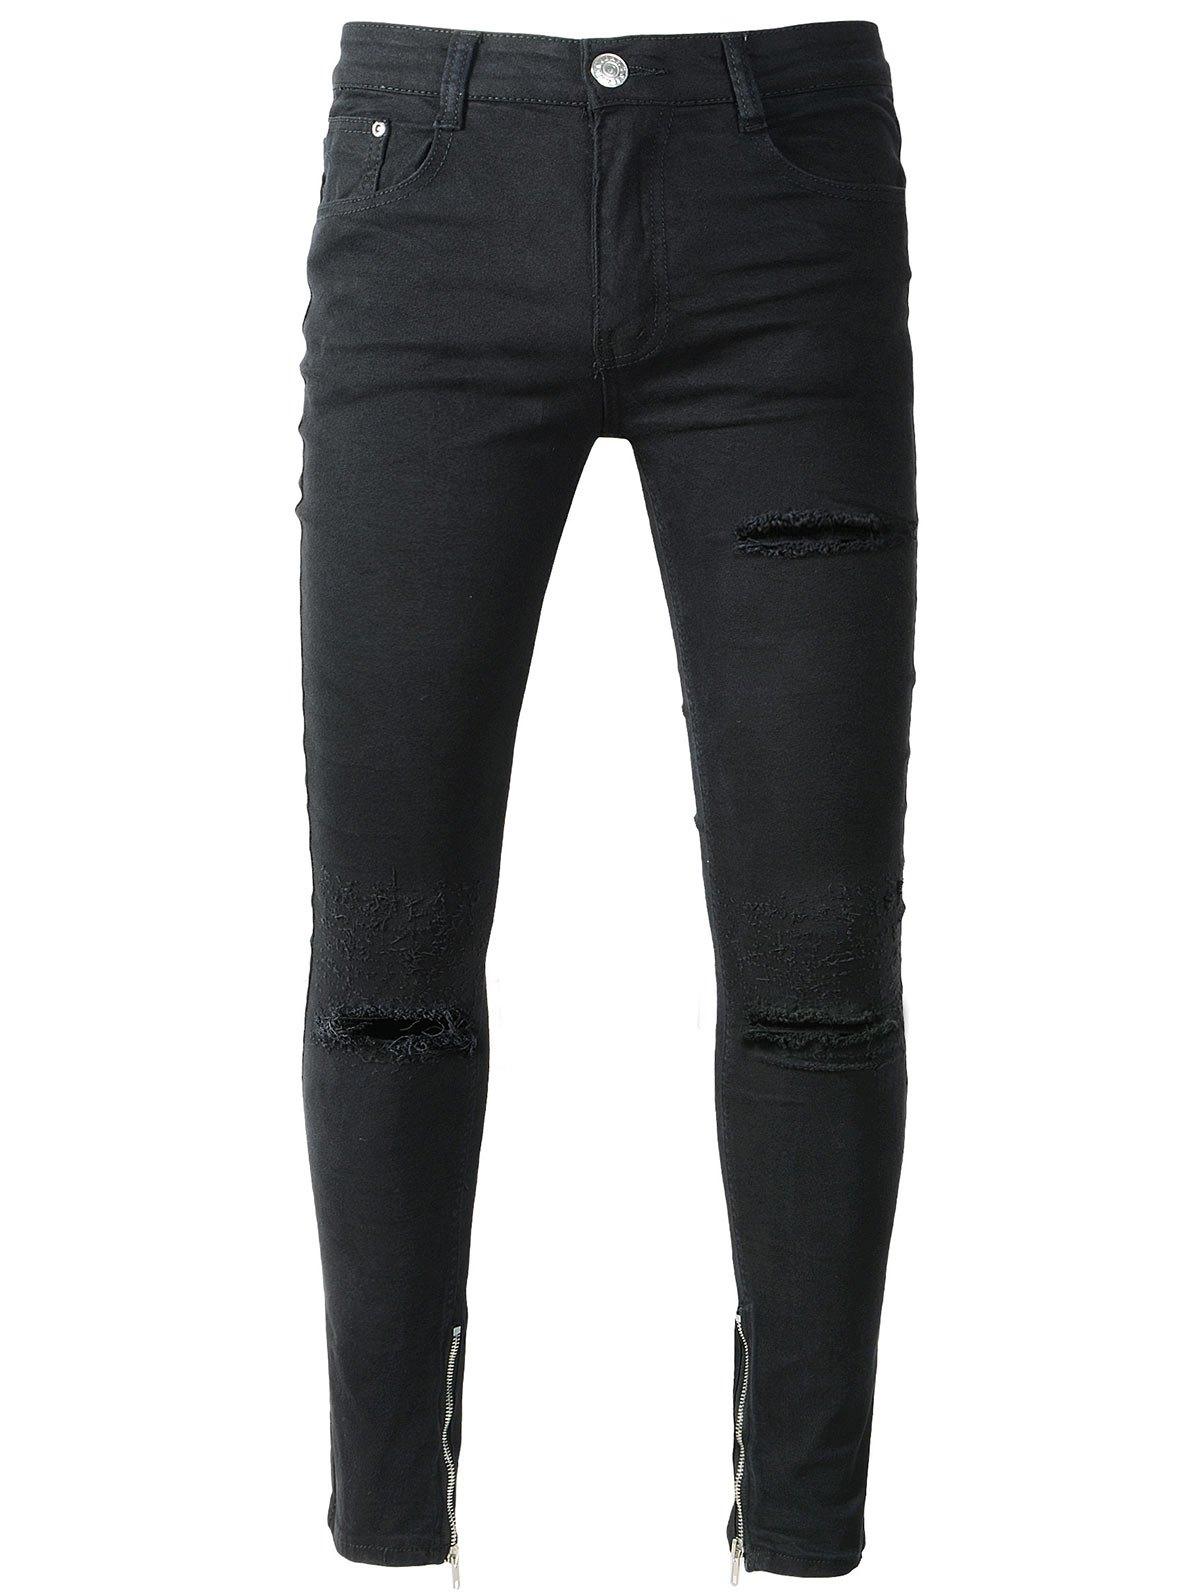 Рваные черные штаны